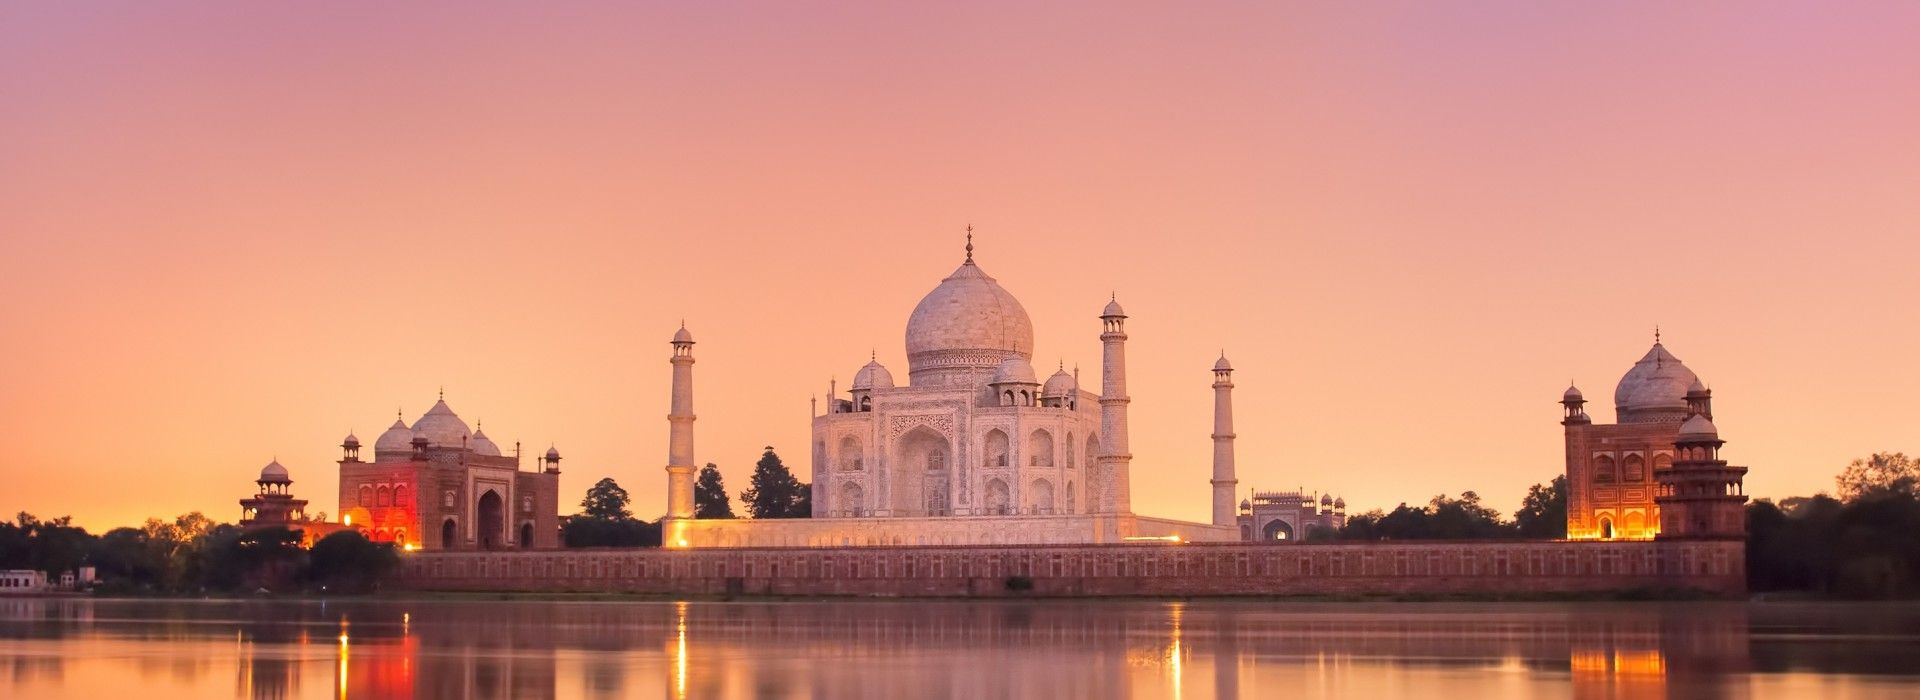 Trekking Tours in Delhi & Golden Triangle